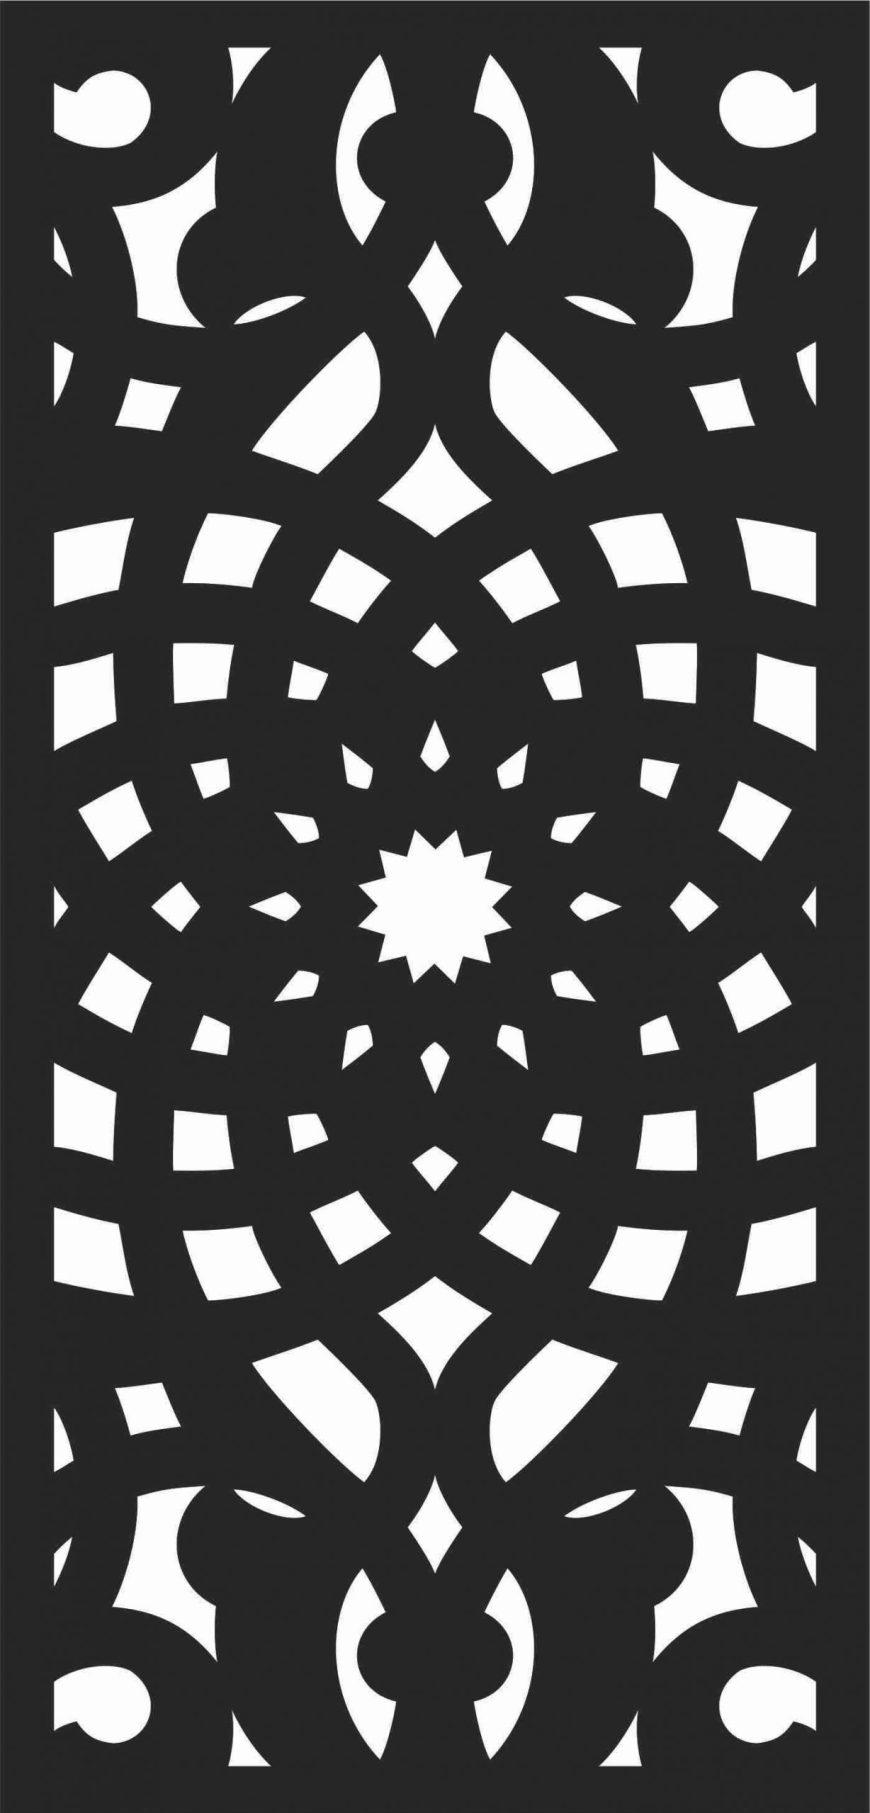 Screen Panel Patterns Seamless 62 Free DXF File